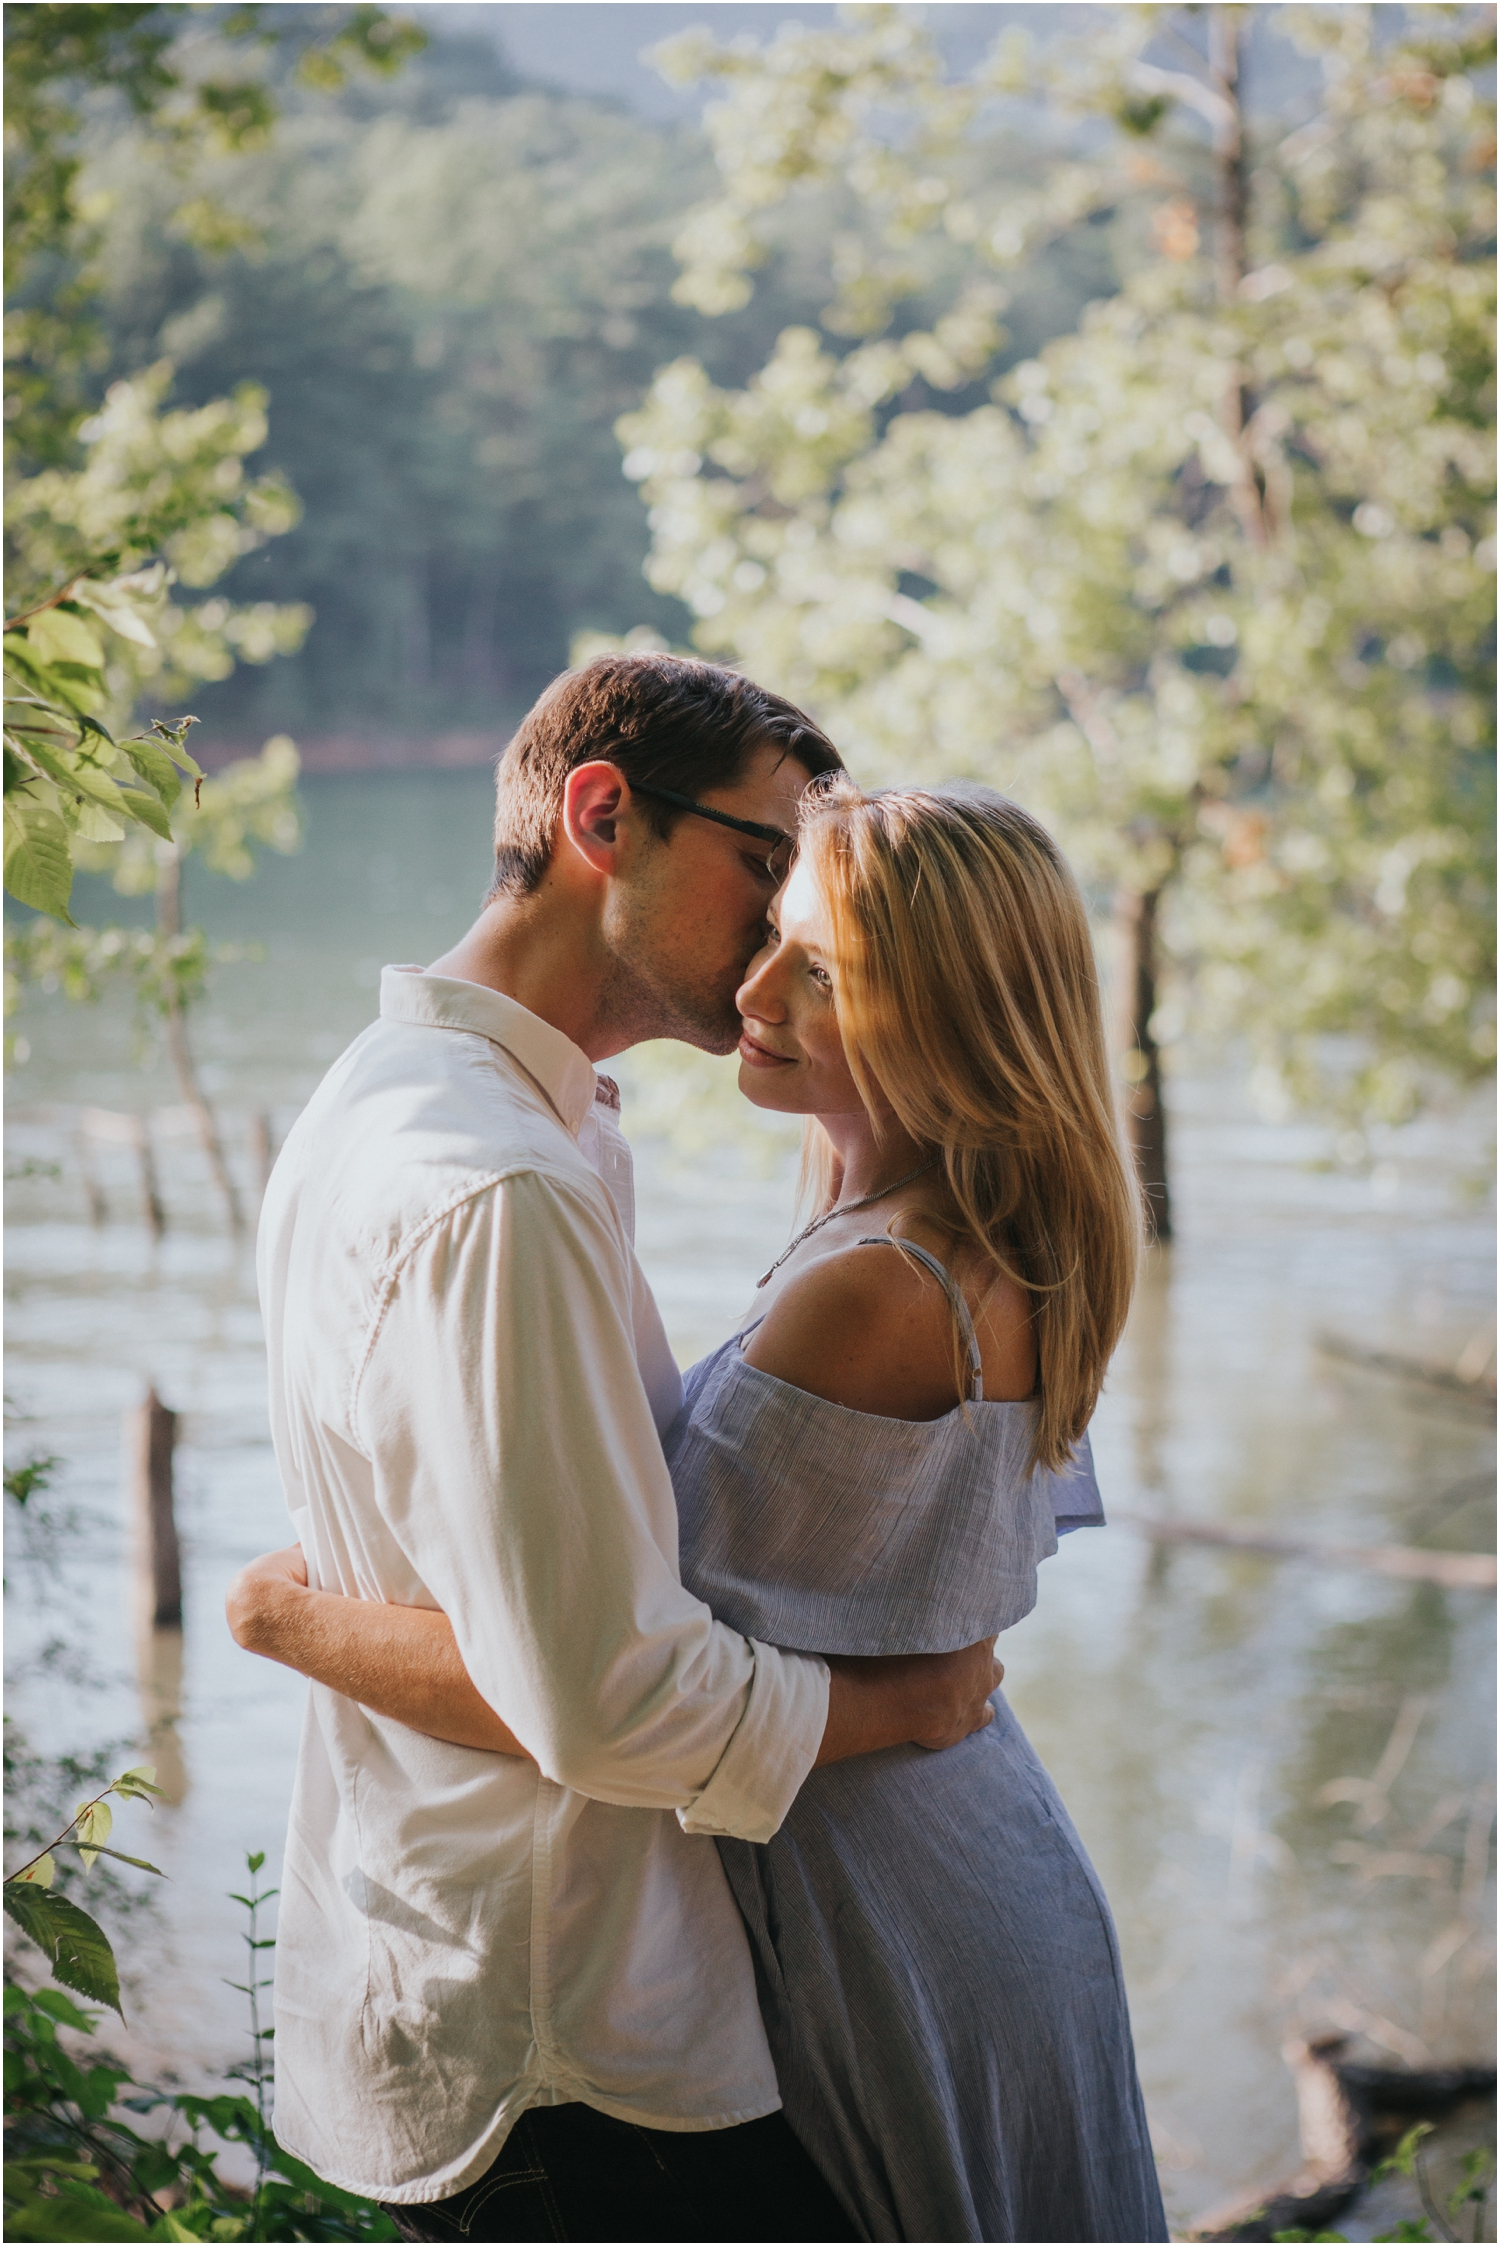 katy-sergent-photography-watauga-lake-engagement-session-northeast-tennessee-wedding-intimate-elopement-engagement-photographer-johnson-city-butler-adventurous-couples-adventure-explore-outdoors_0003.jpg